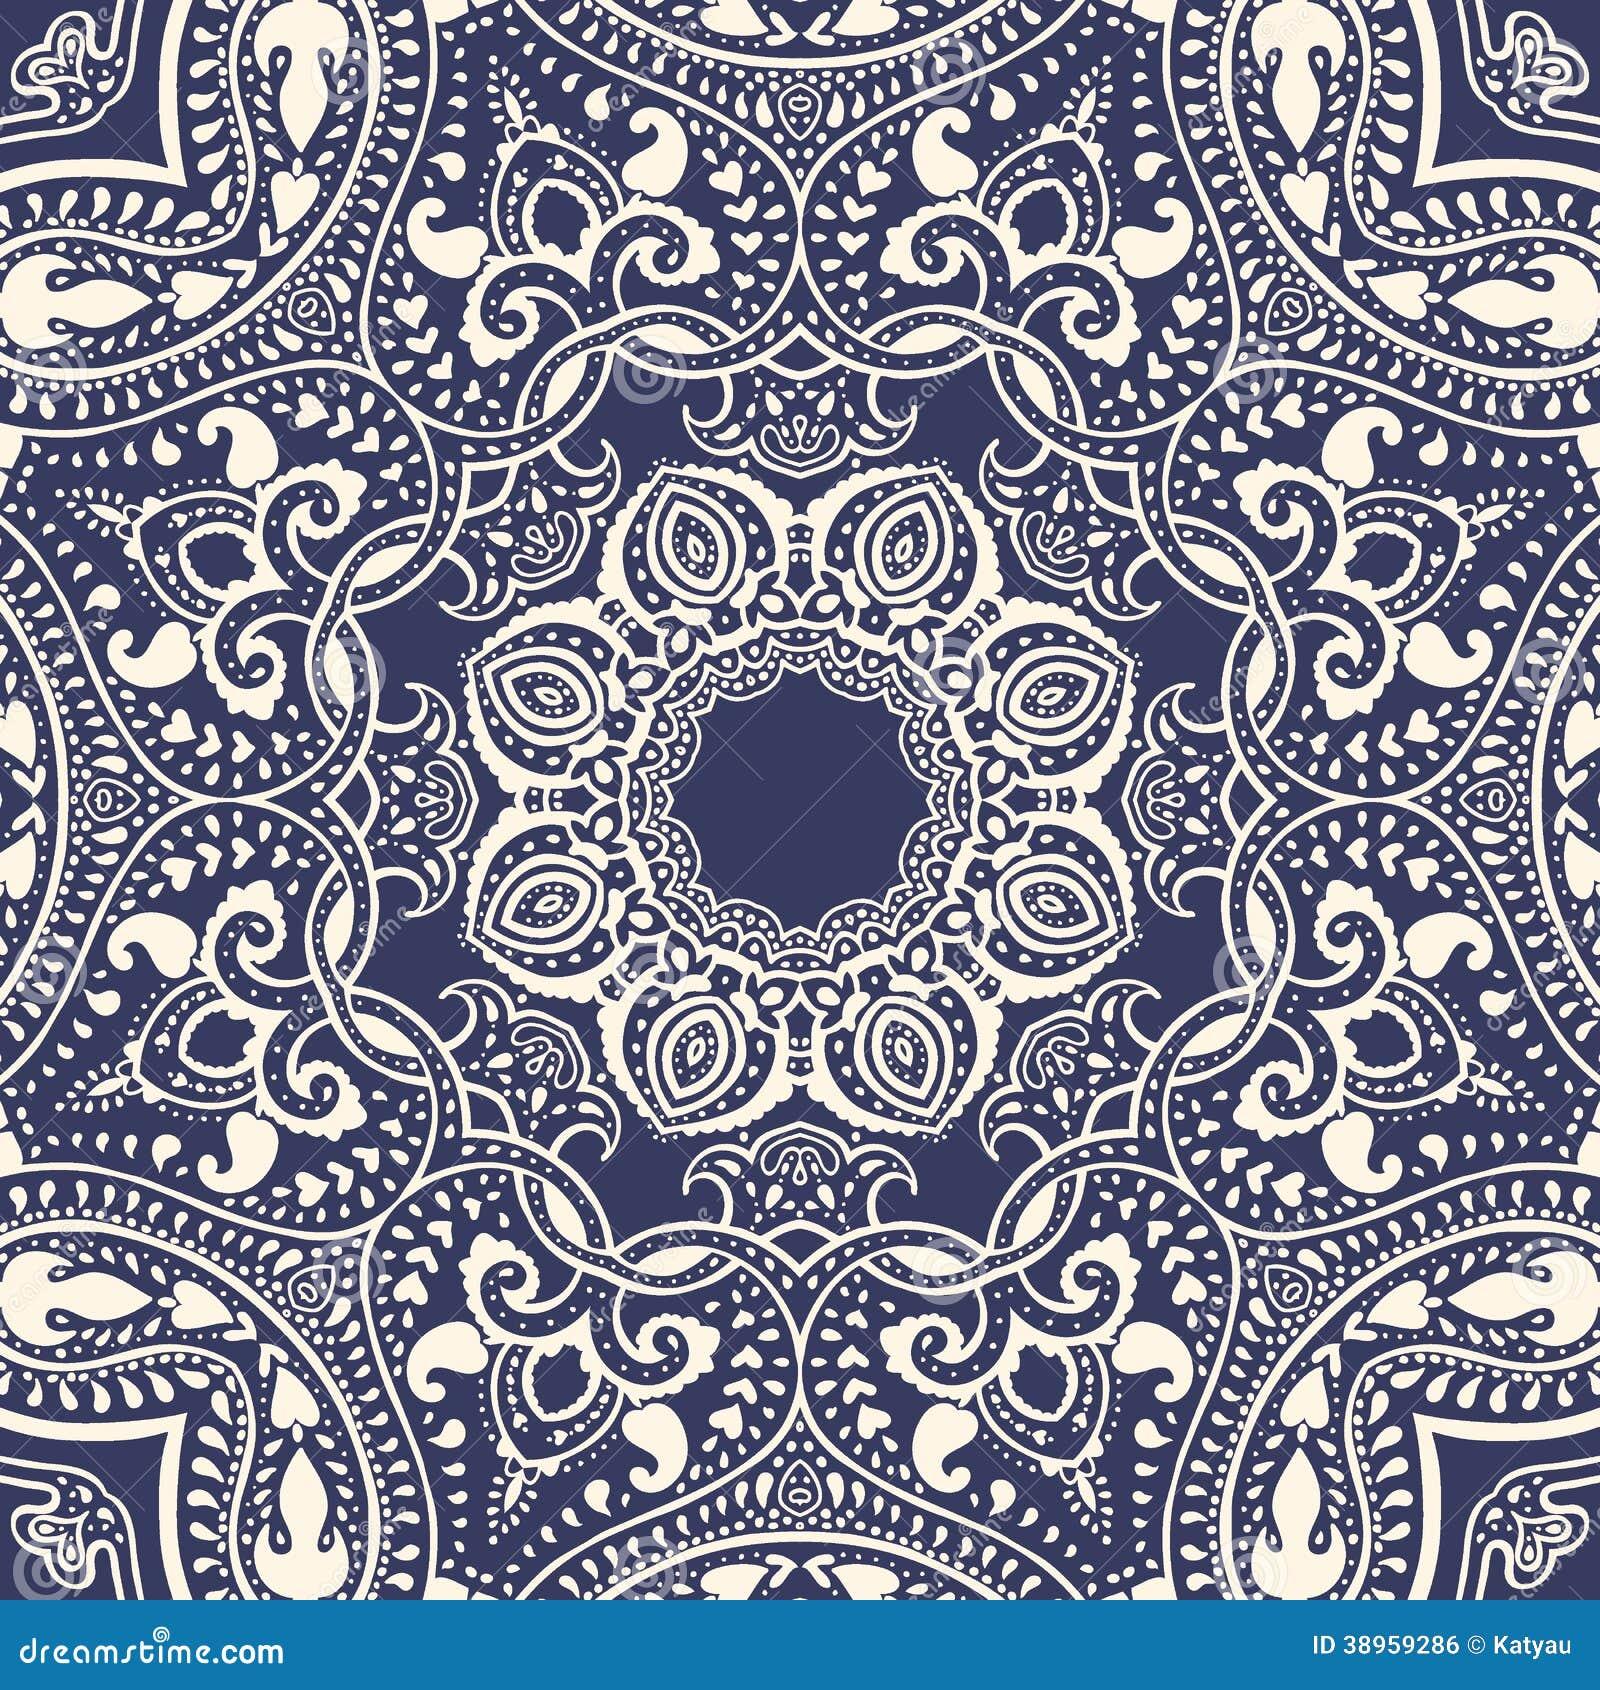 mandala indisches dekoratives muster stock abbildung bild 38959286. Black Bedroom Furniture Sets. Home Design Ideas